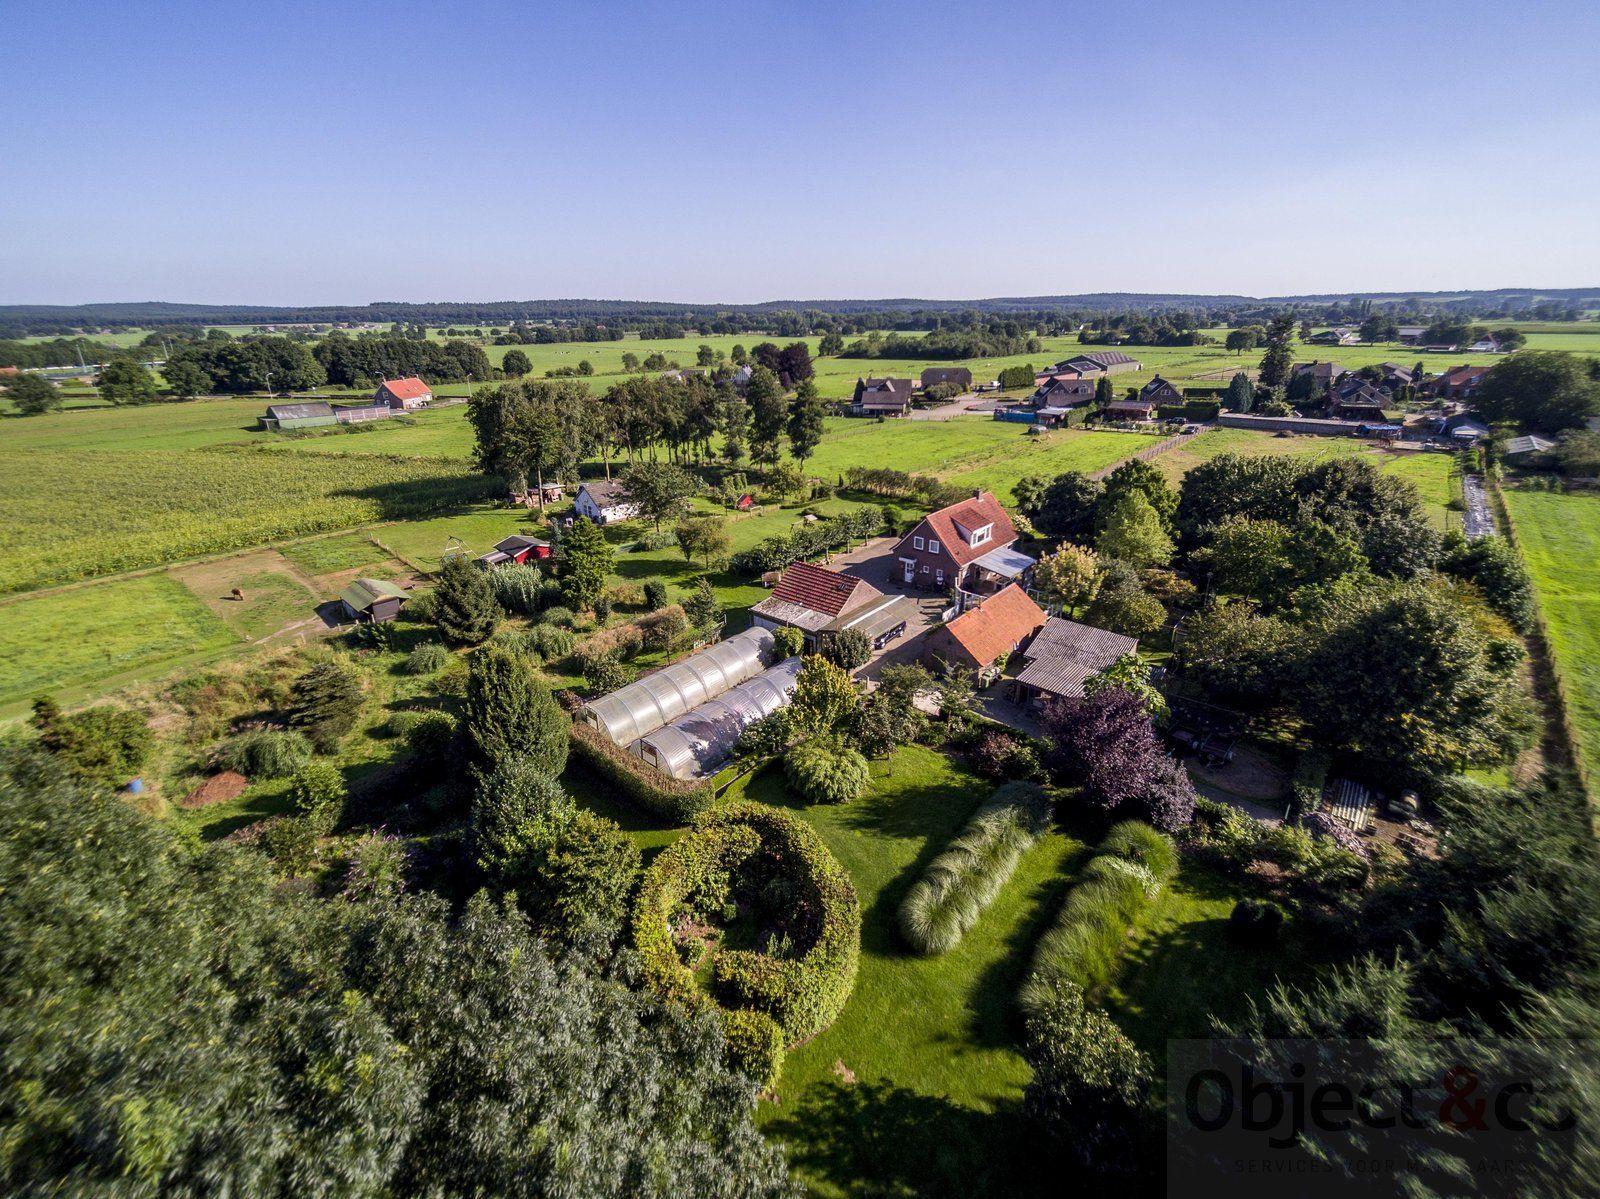 Hoge Horst 53 - Groesbeek photo collection by Object&co Nederland BV